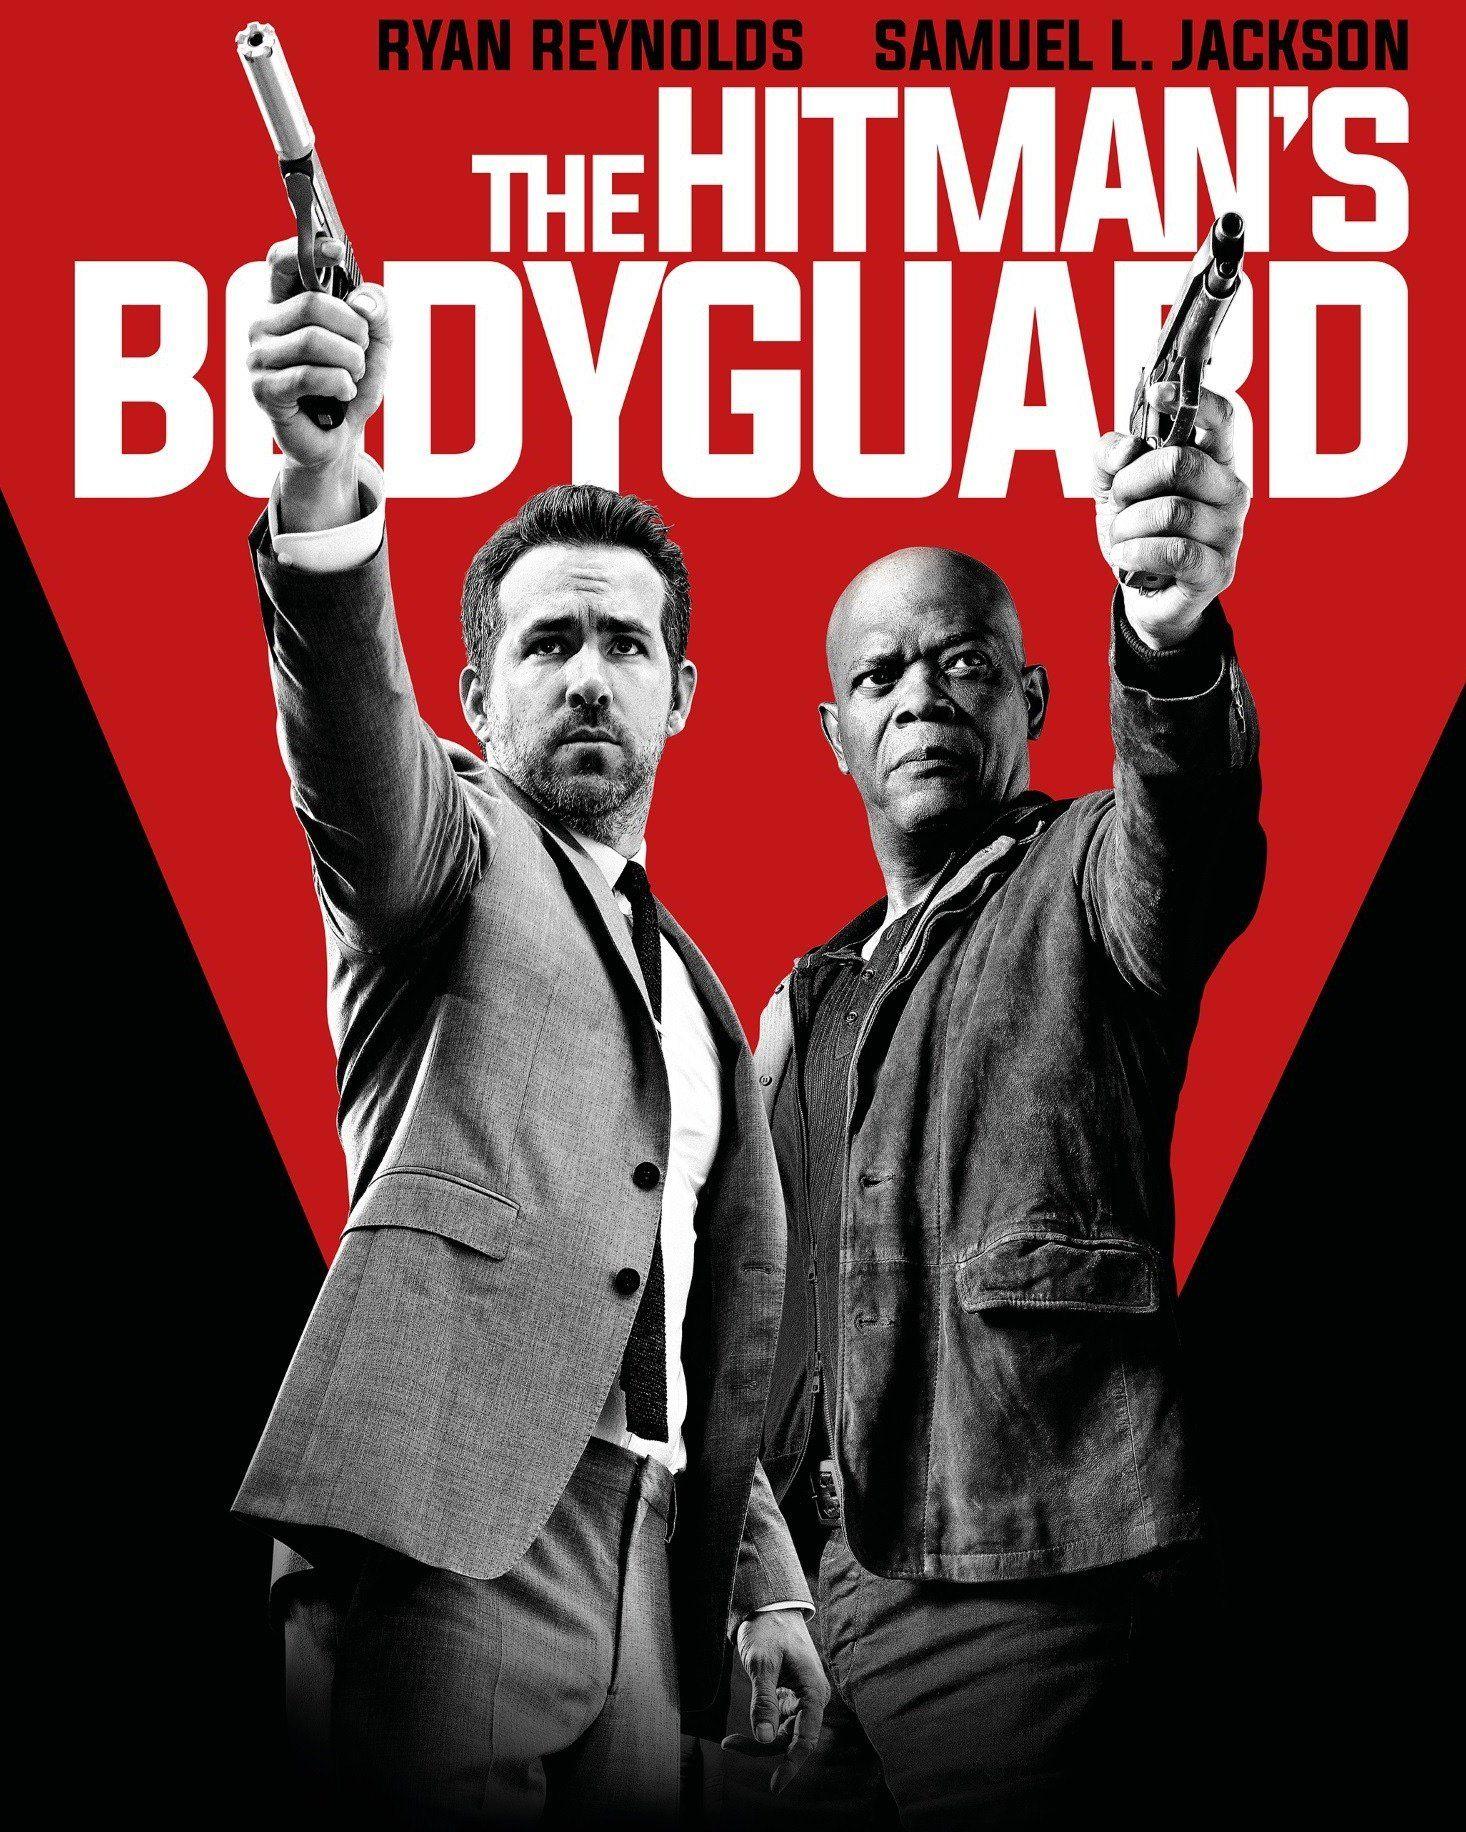 The Hitman S Bodyguard Wallpaper For Mac Jpj Movie Desktop Hd